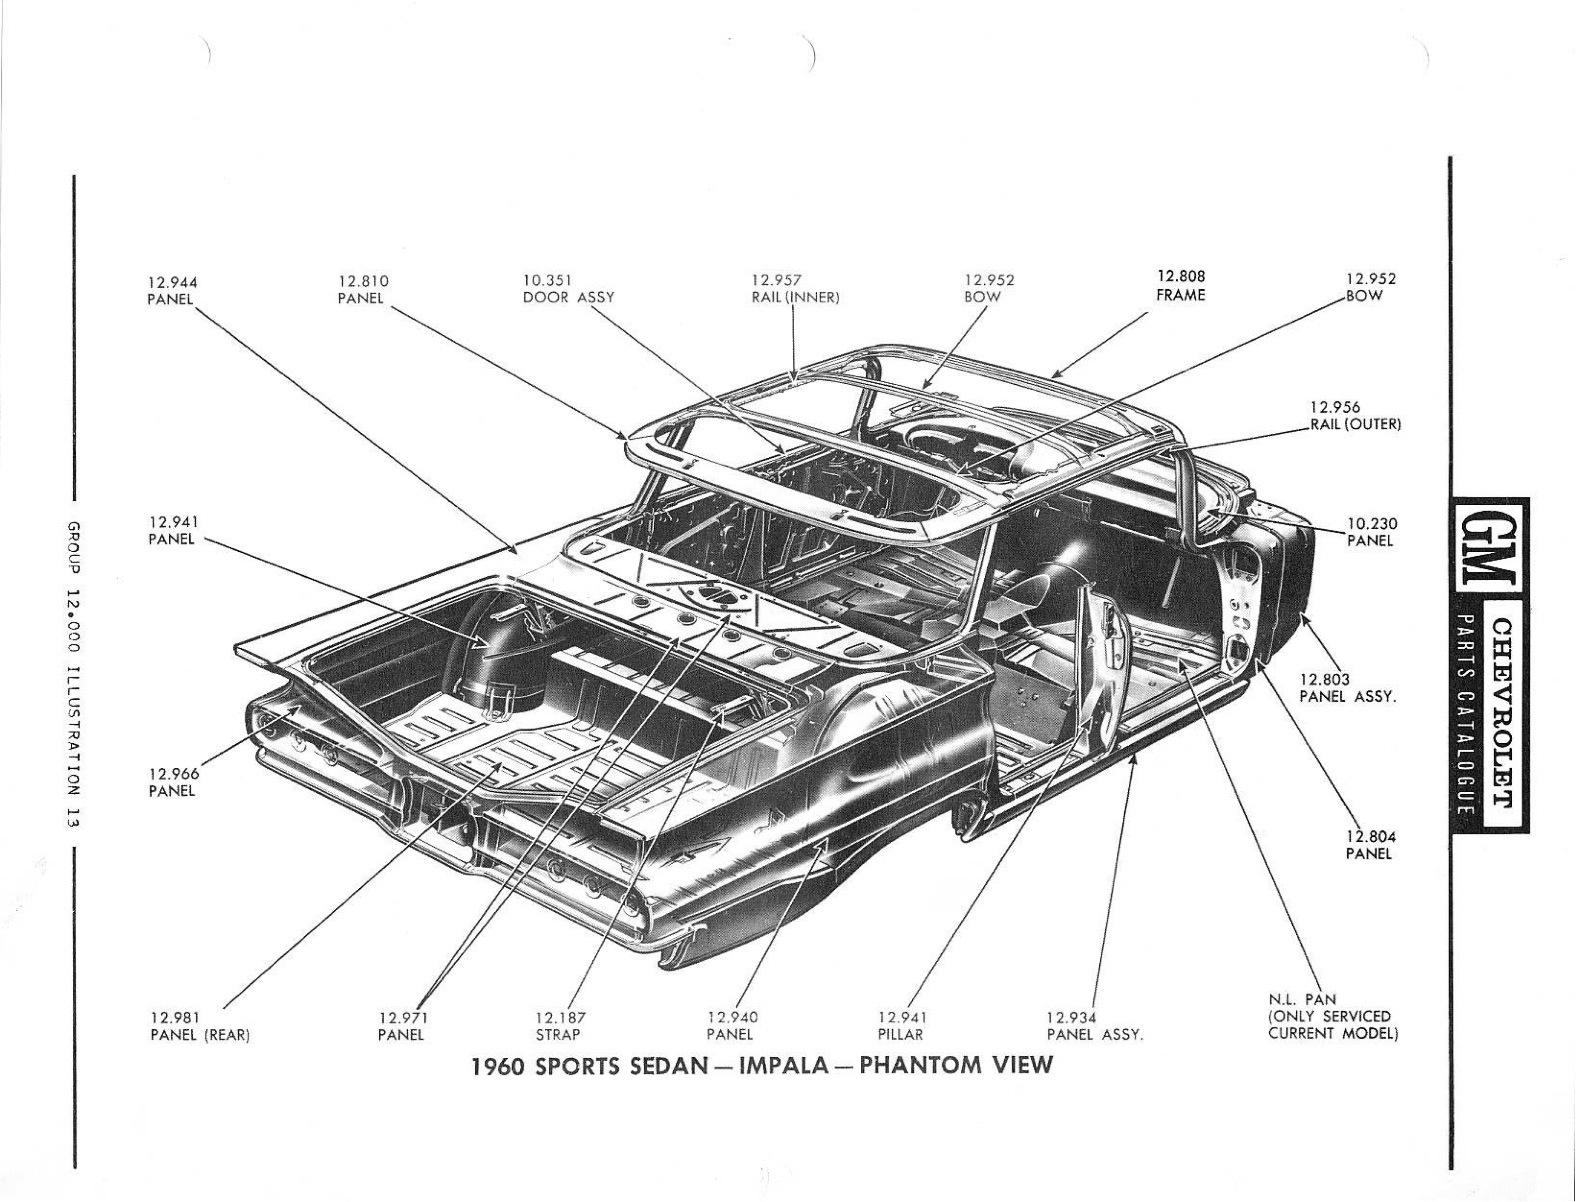 Ford Ranger Wiring Diagram 1967 Ford F100 Wiring Diagram Ford F 250